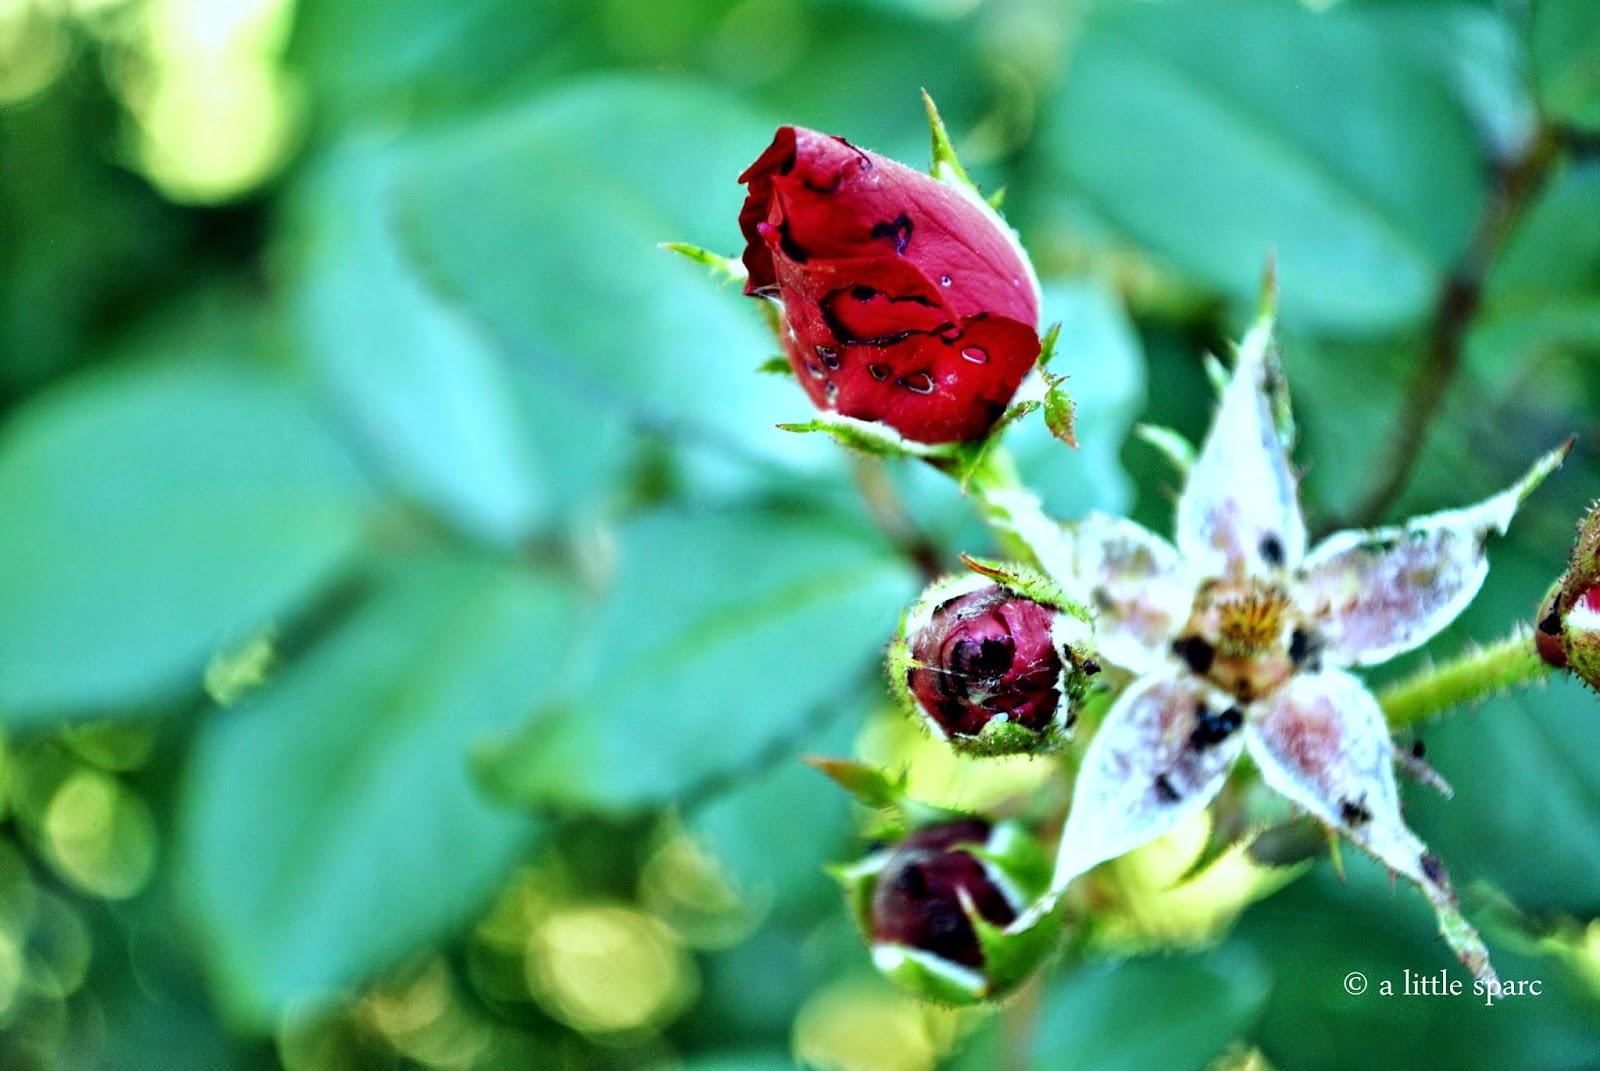 sweetness of a rose